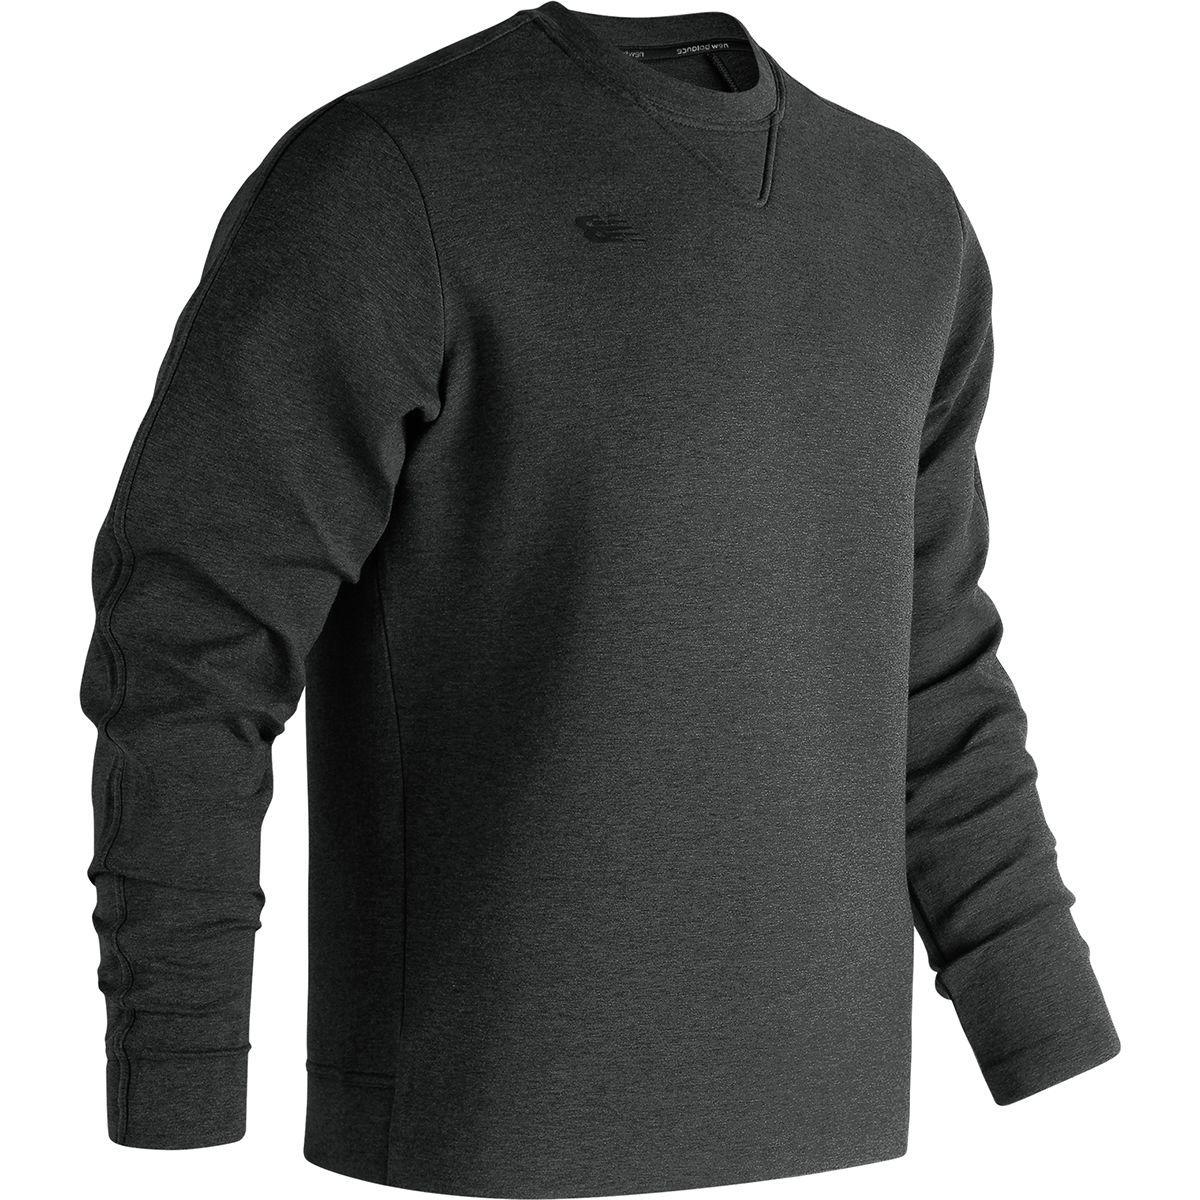 New Balance 247 Luxe Crew Shirt - Men's